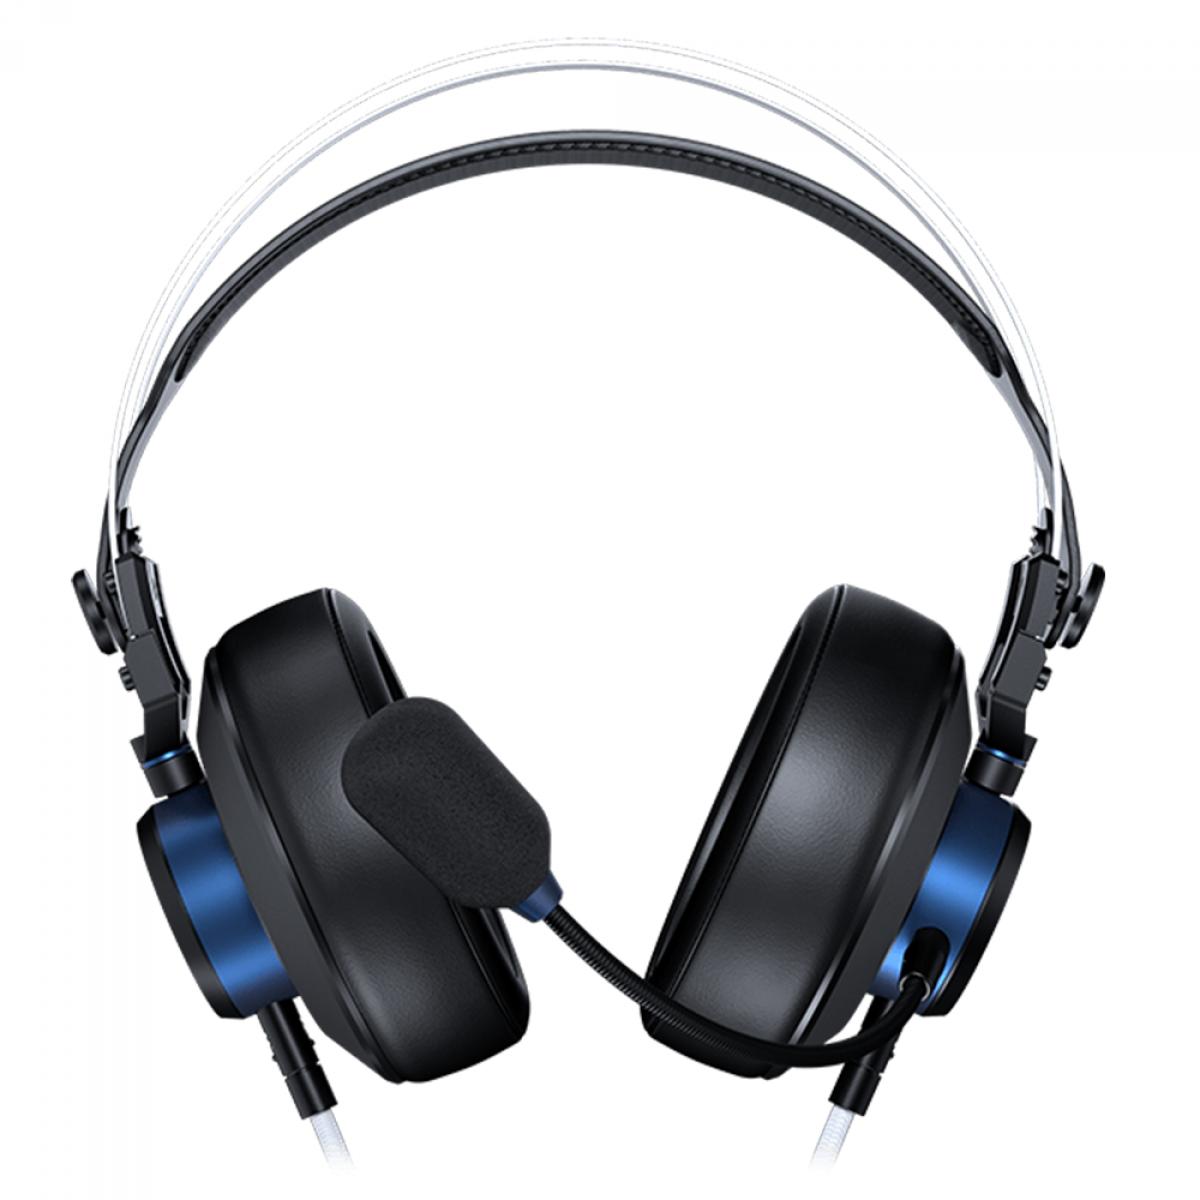 Headset Gamer Cougar VM410 PS, 3.5mm, Multi Plataforma, Black/Blue, 3H550P53S.0001